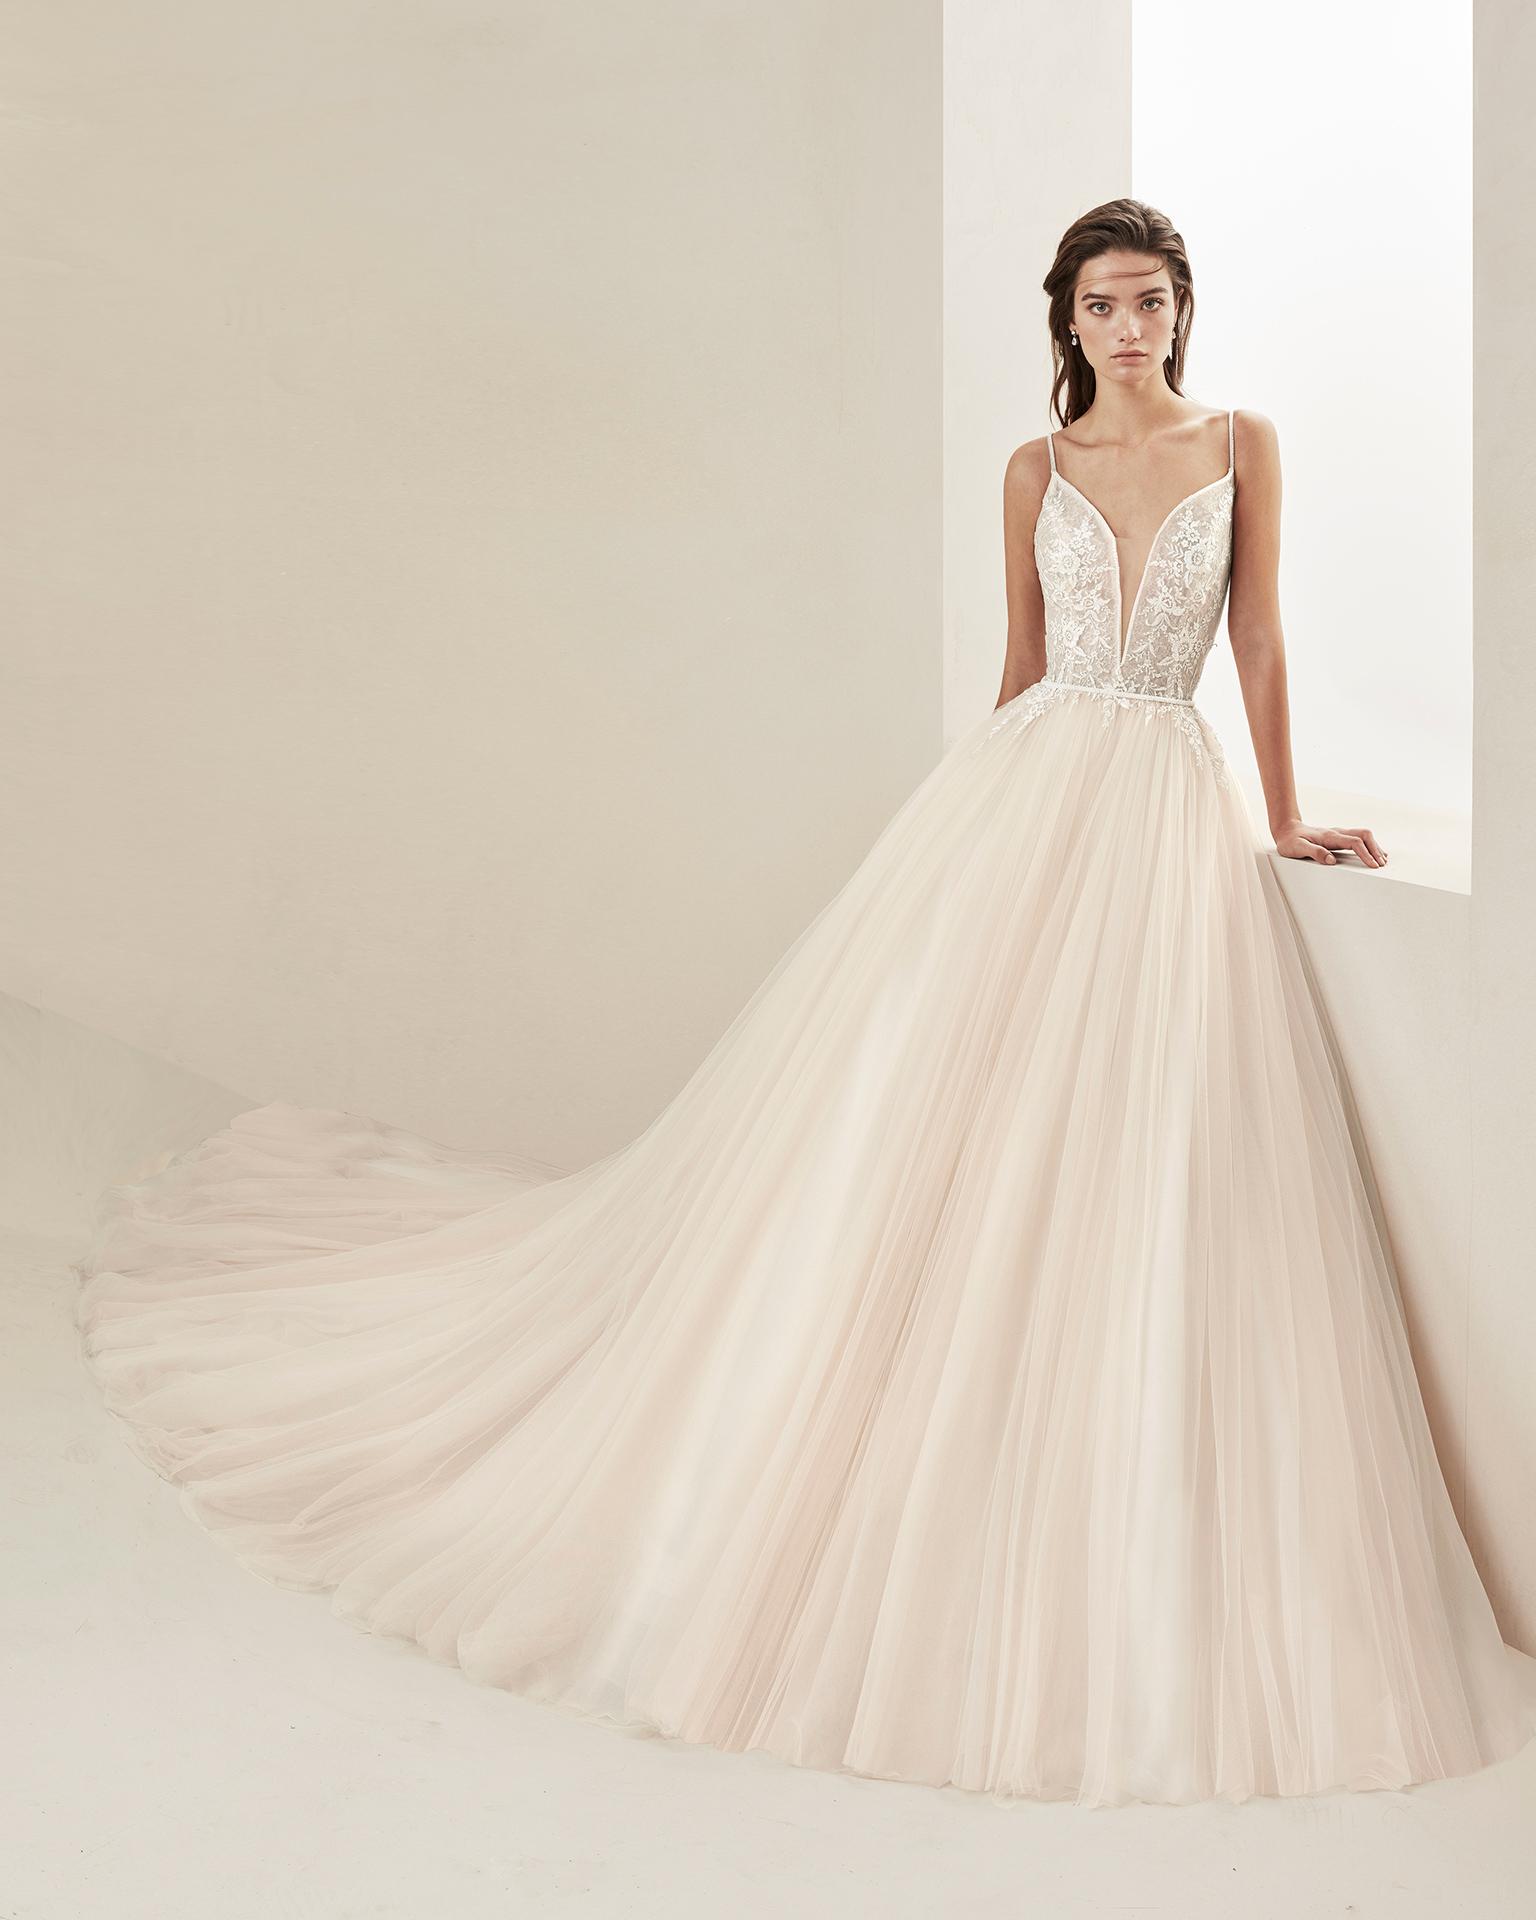 Vestidos de novia encaje y tul